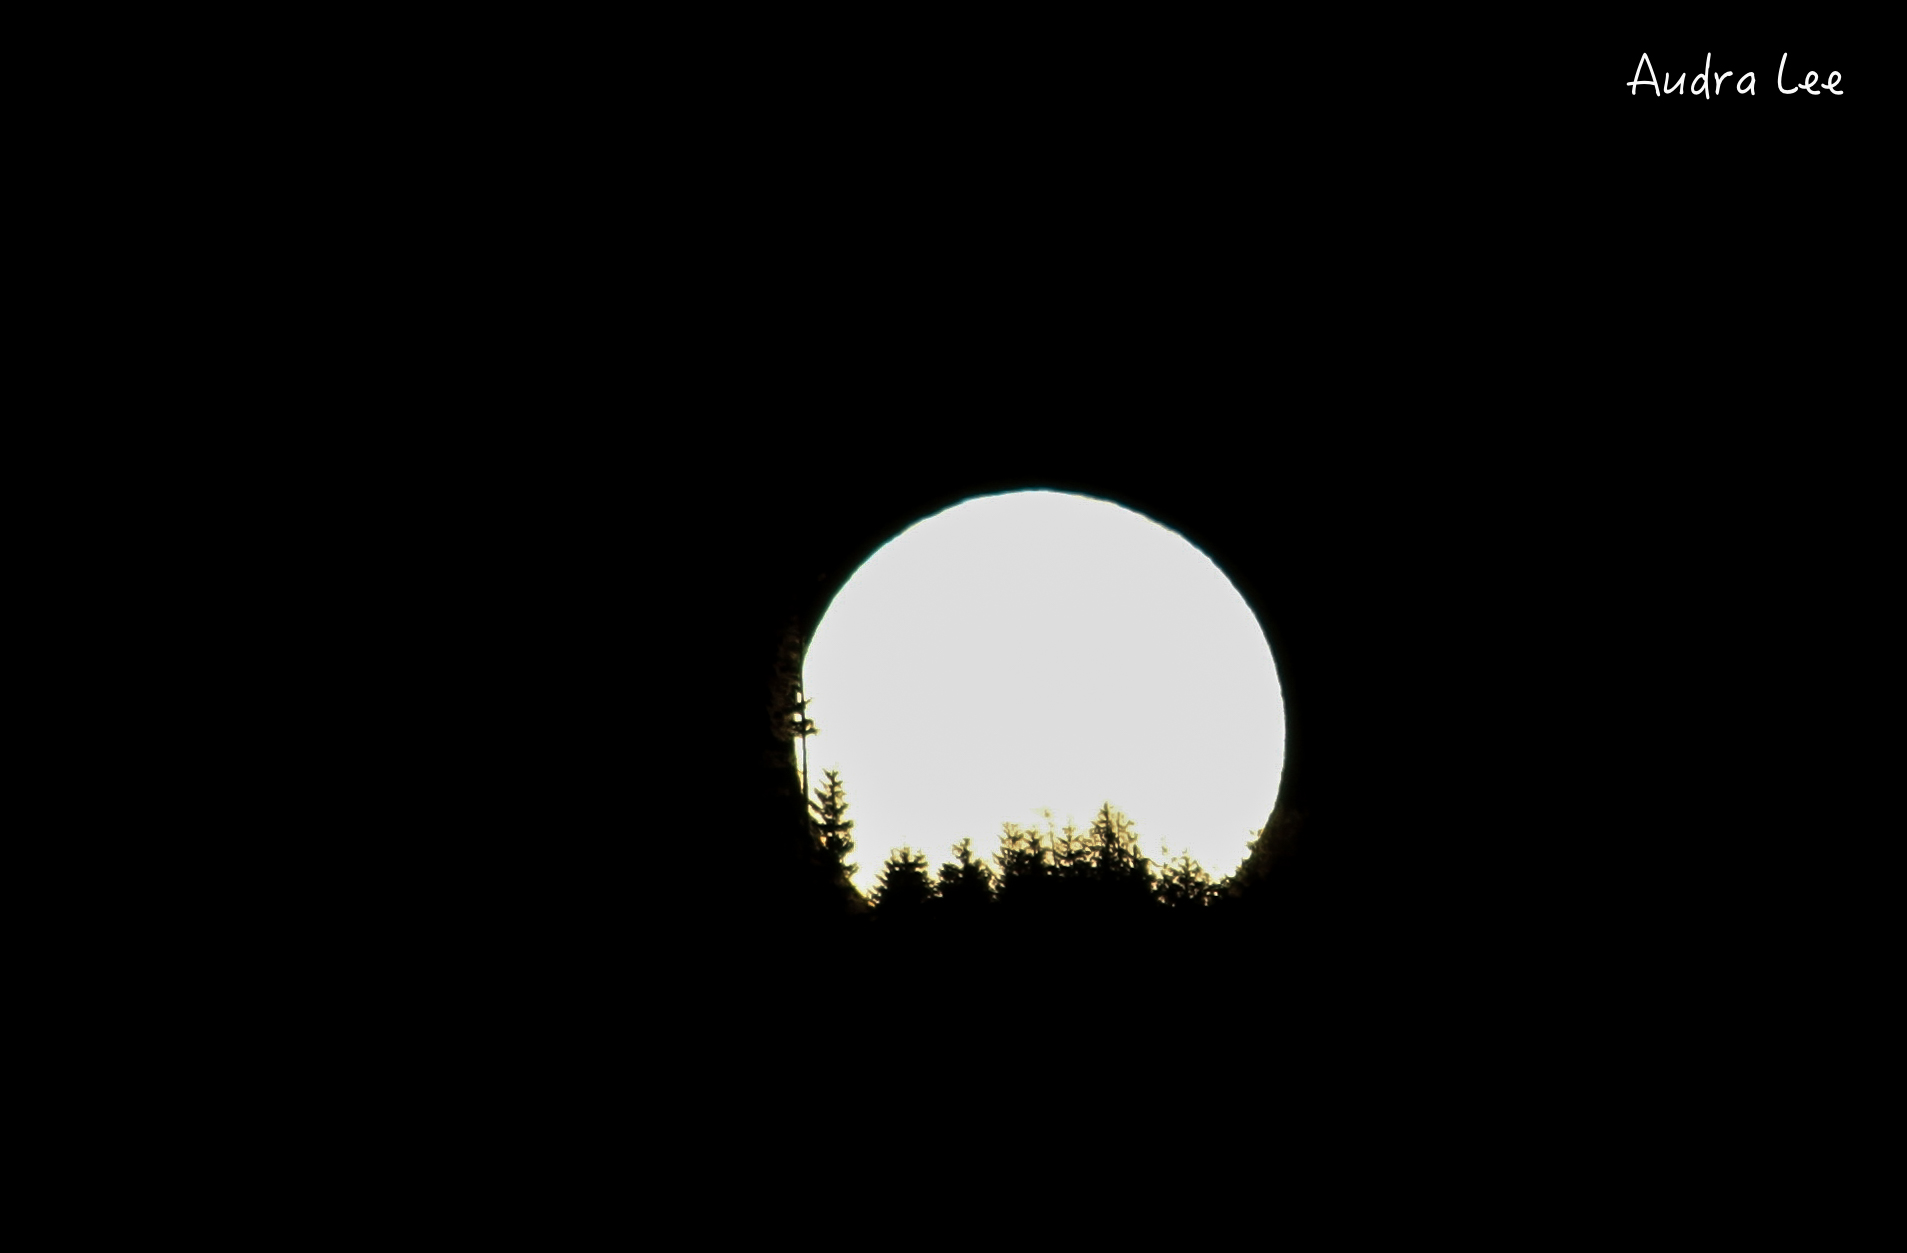 Winter Moon in Whatcom County